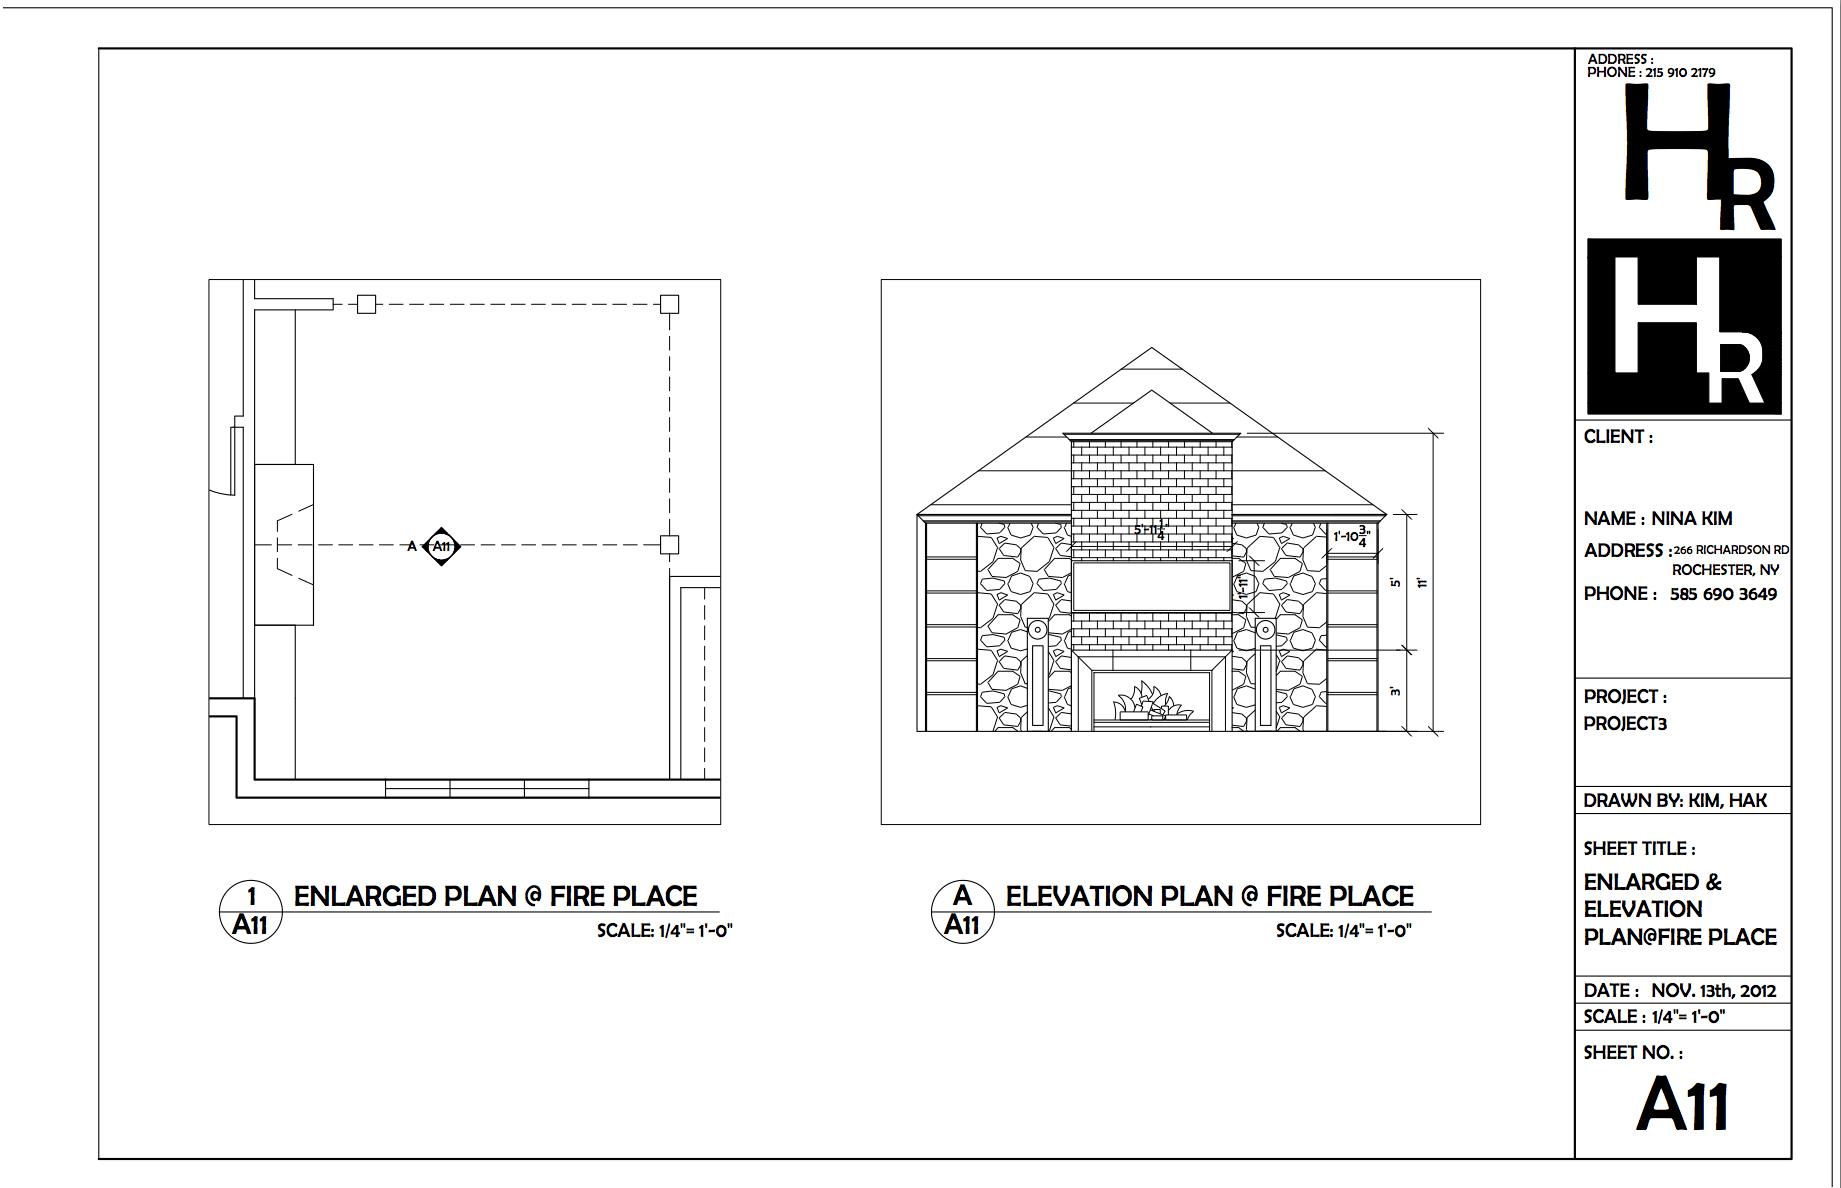 Stone Work In Elevation Symbol : Fireplace elevation plan portfolio autocad pinterest